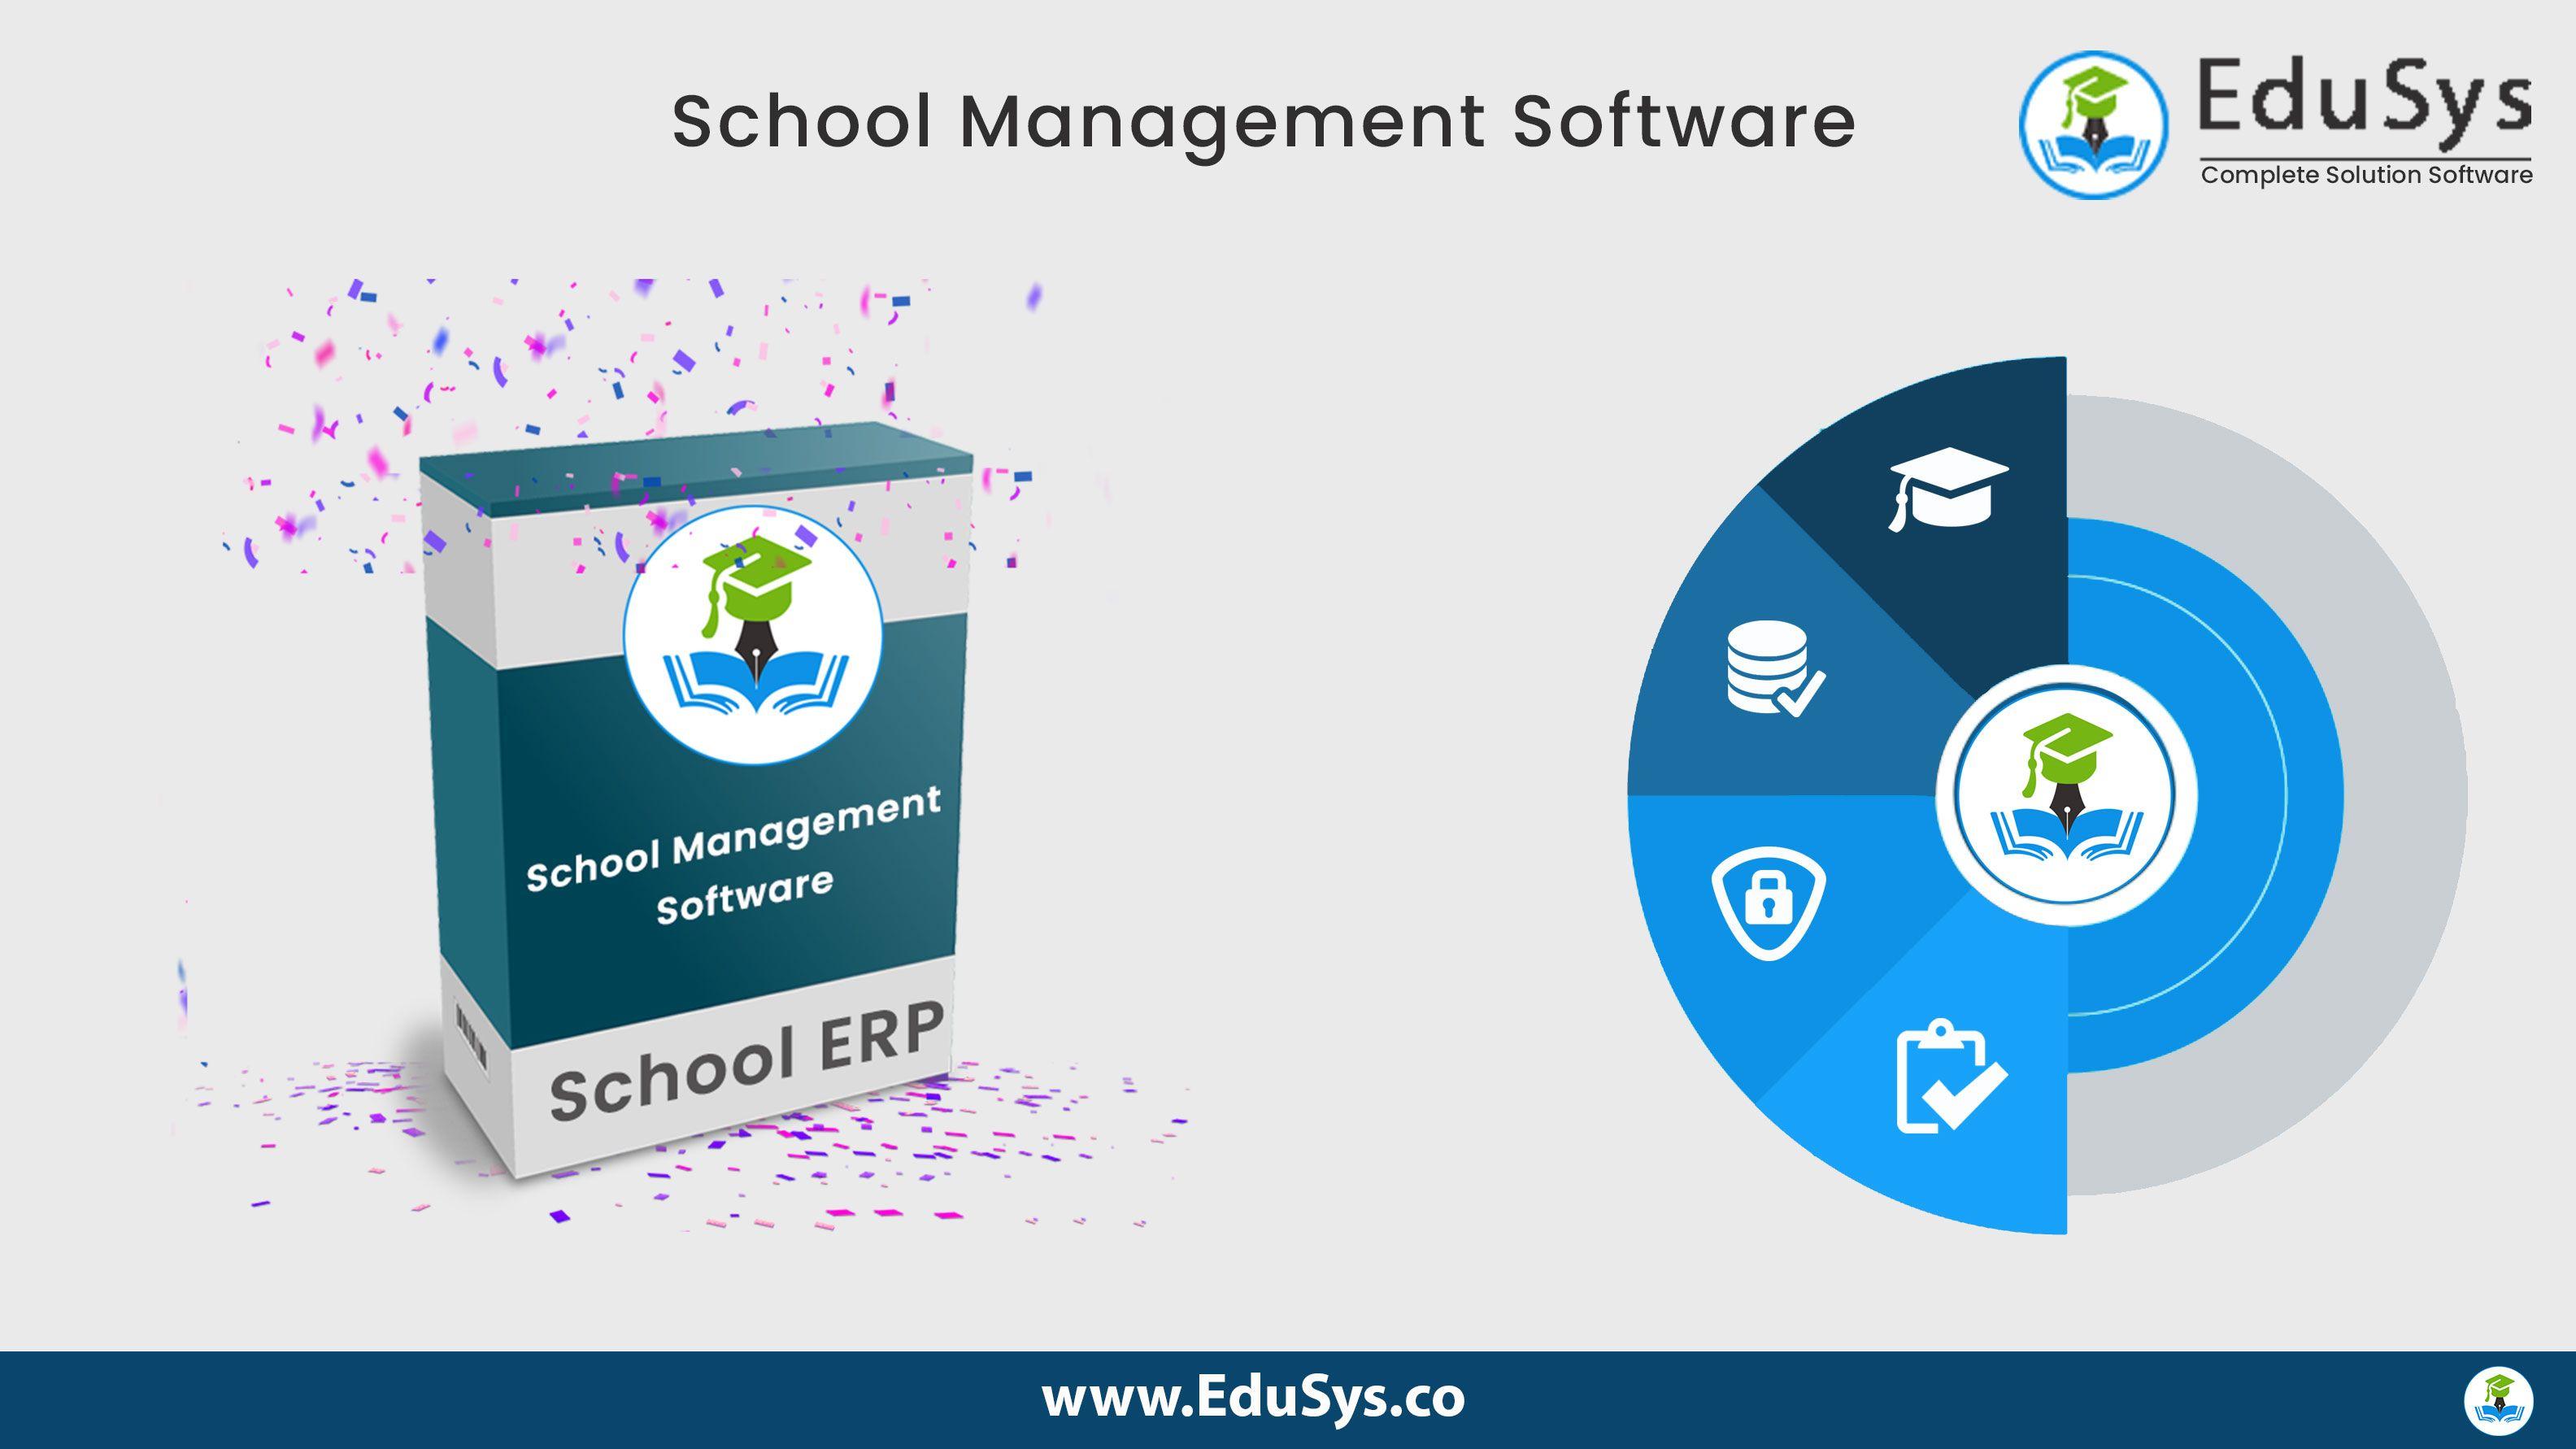 School Management Software Key Features Free Website 30